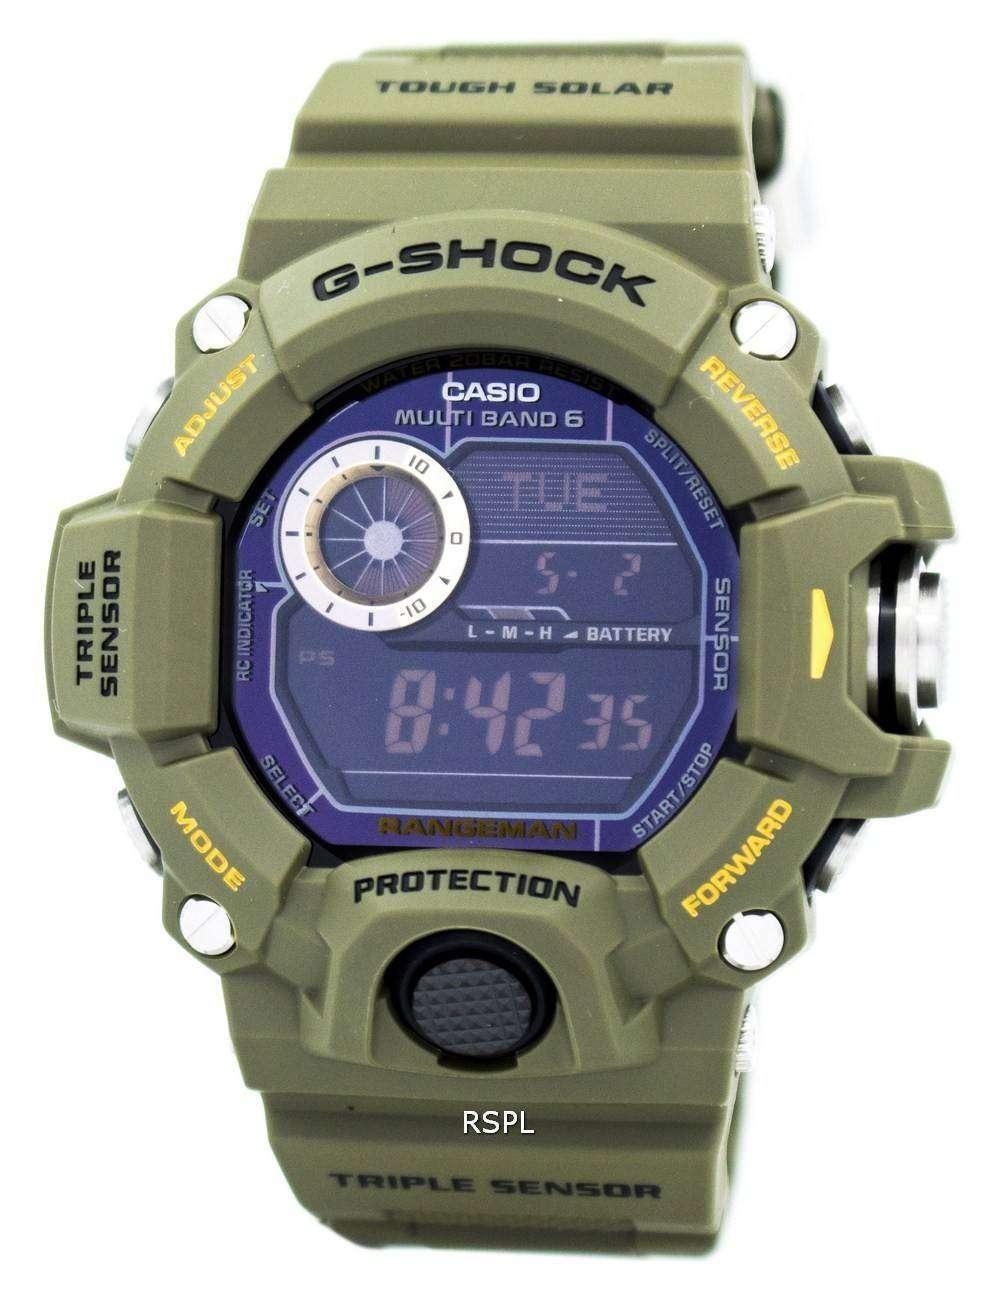 d5297c9bd4a3 Reloj Casio G-Shock Rangeman multi banda atómica GW-9400-3 de los ...